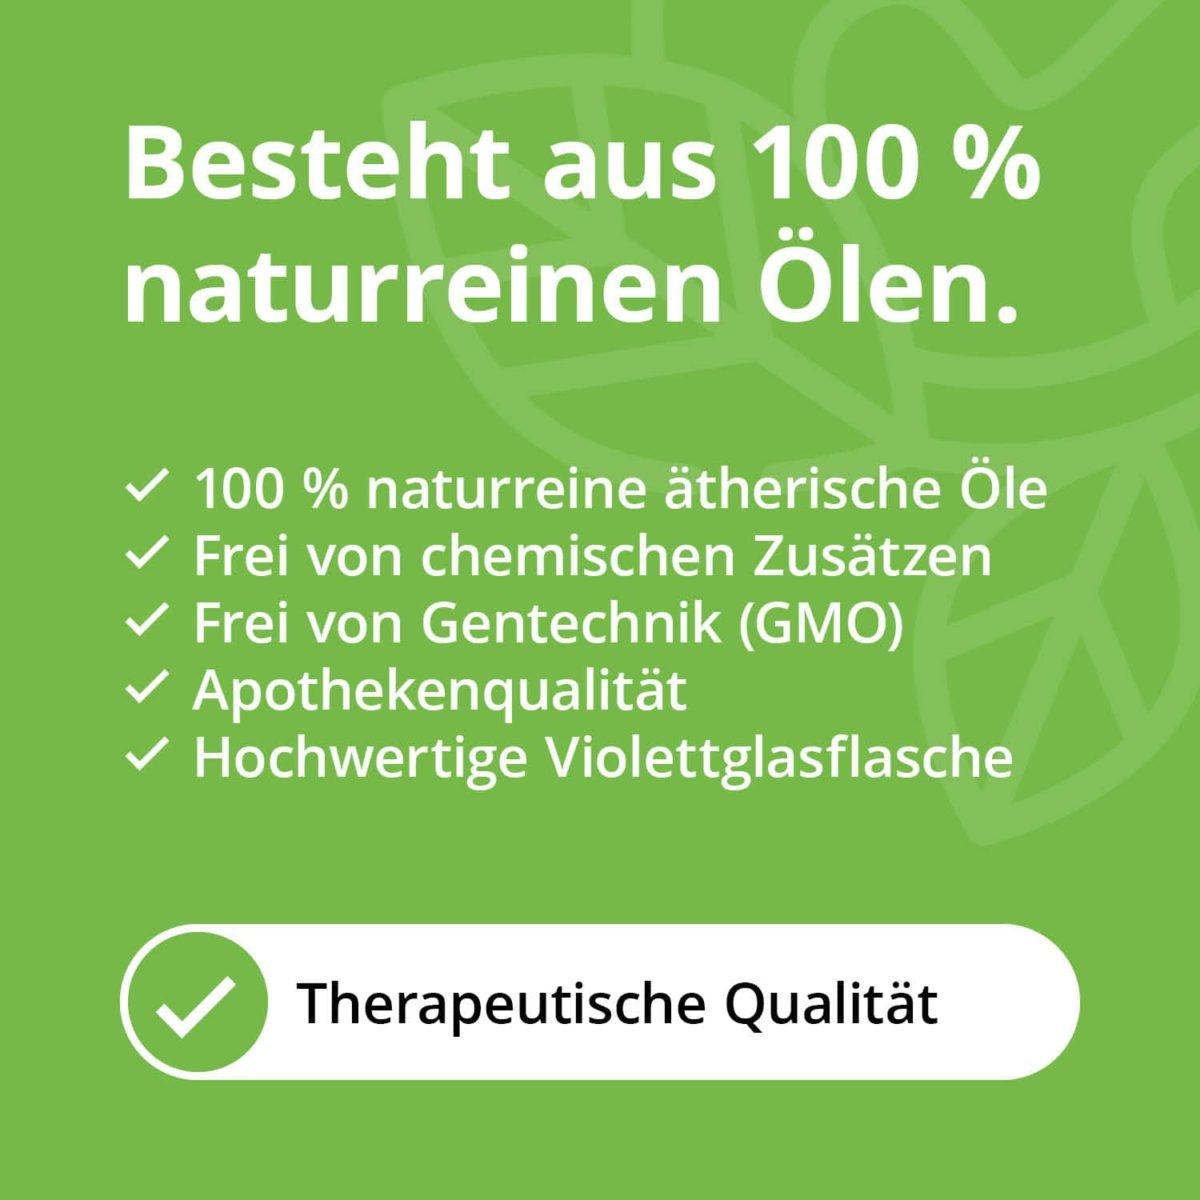 Casida Duftmischung Befreiter Kopf - 5 ml 17394523 PZN Apotheke Kopfschmerzen Aromatherapie Aromapflege Aromaschmuck Diffuser5